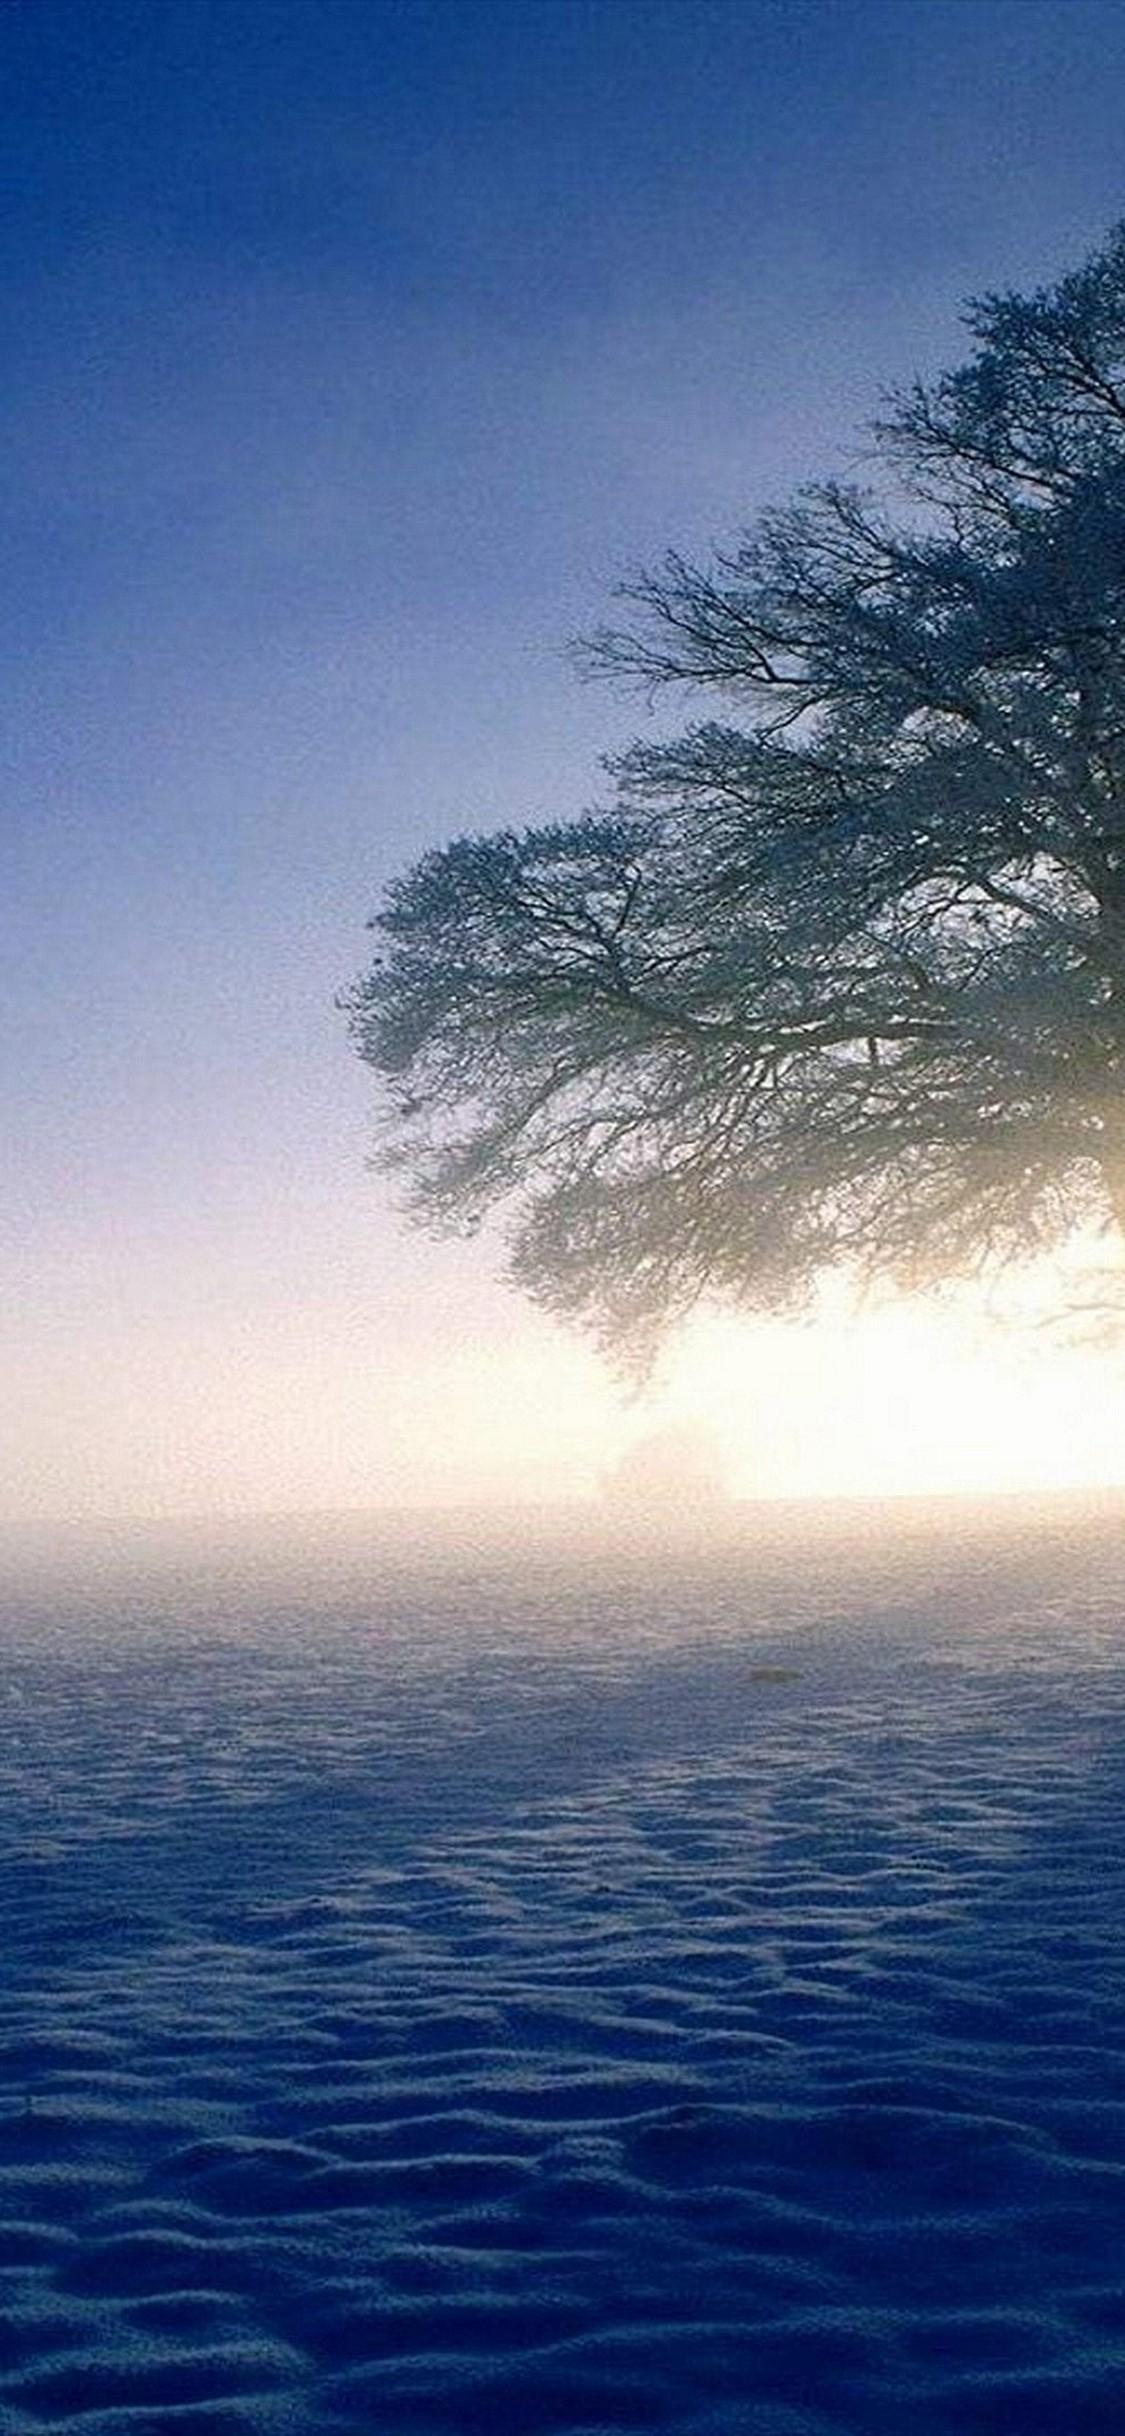 Plandscapes Nature Winter Snow Sun Hd Wallpaper 1125x2436